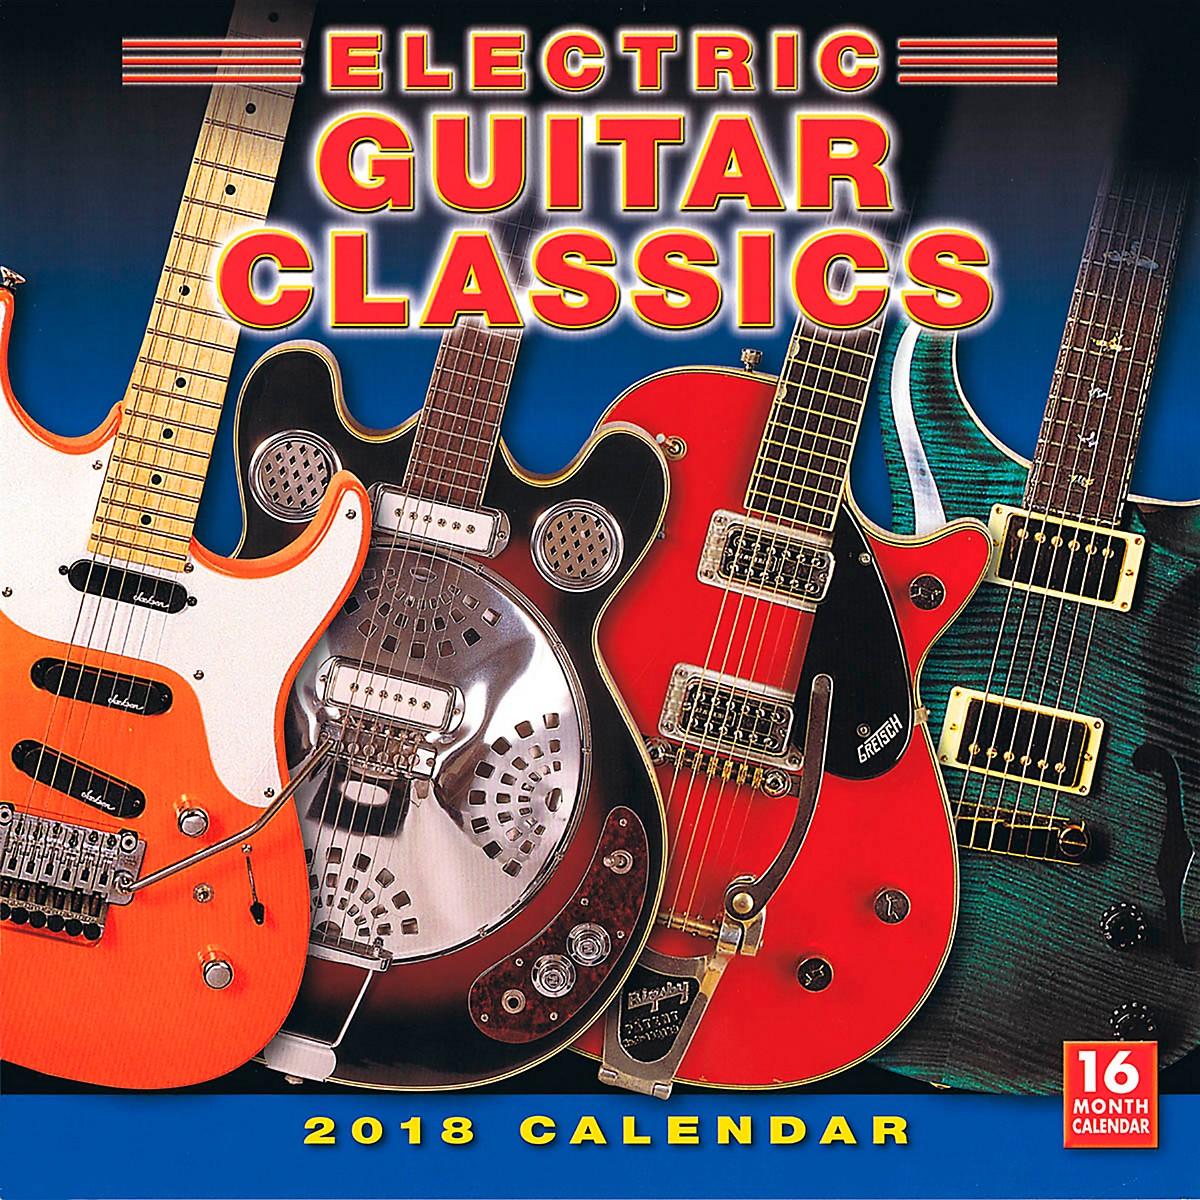 Hal Leonard 2018 Electric Guitar Classics Wall Calendar 16 Months